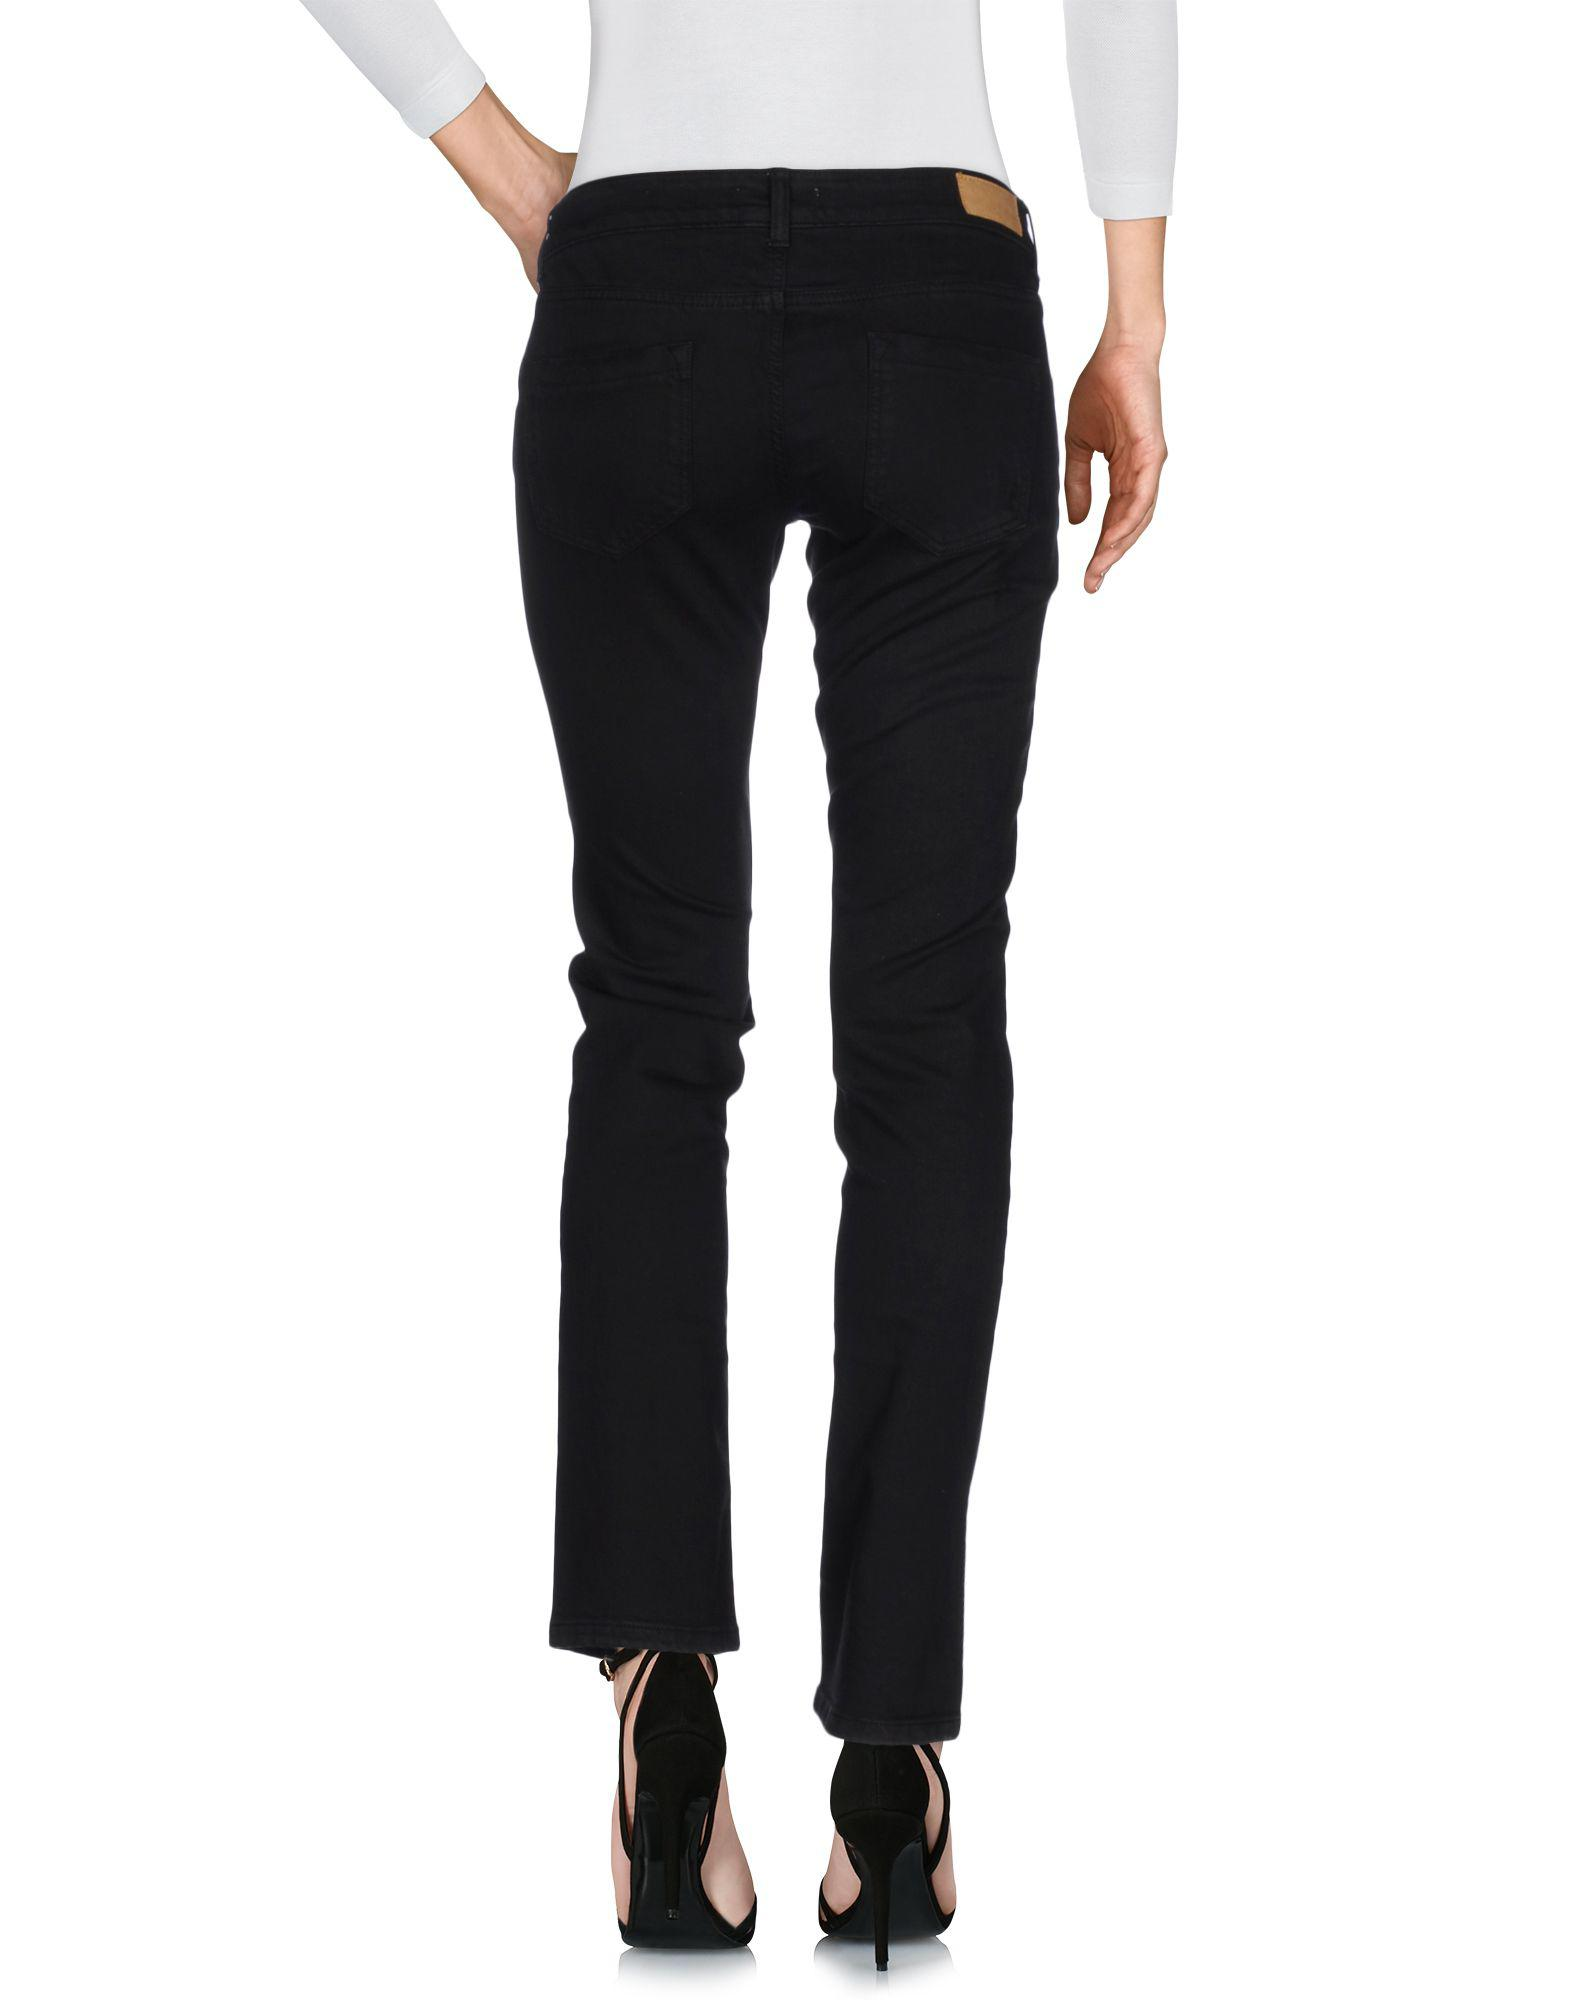 DENIM - Denim trousers Souvenir For Sale The Cheapest eyTwc